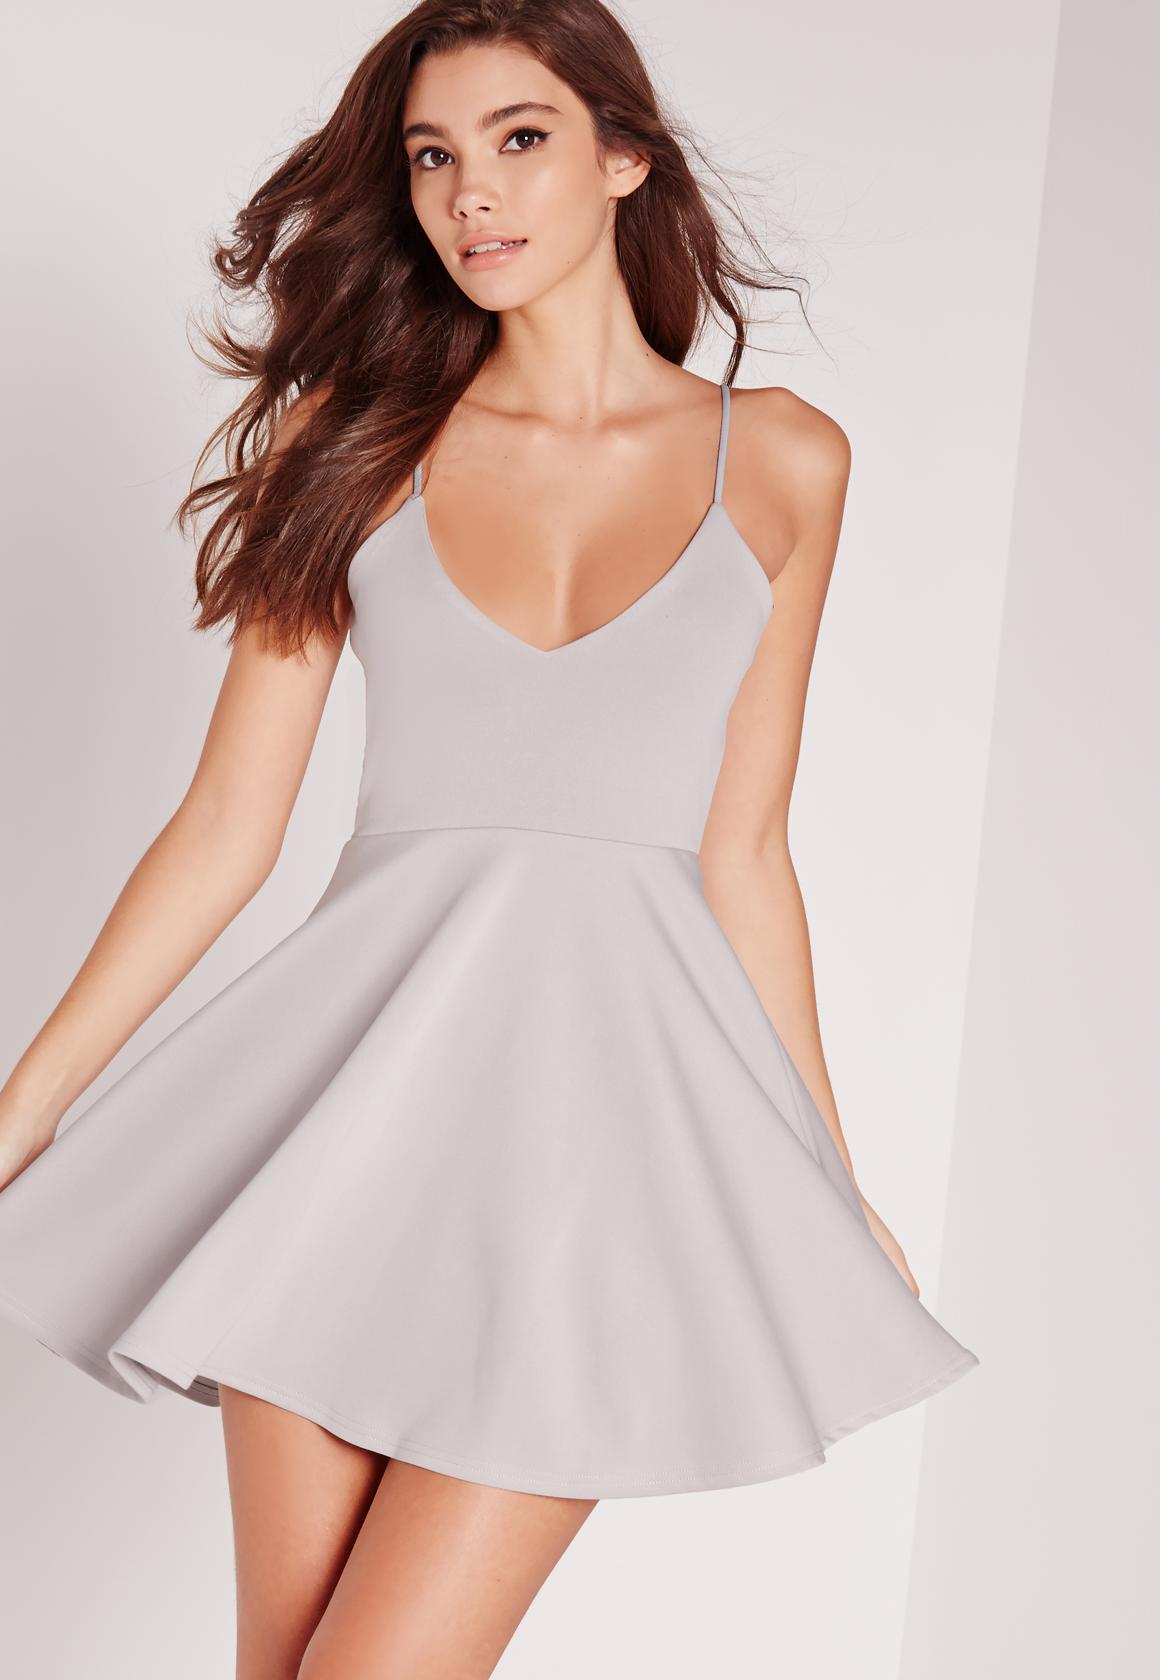 Prom Dresses 2018 - Long & Short Dance Dresses   Missguided